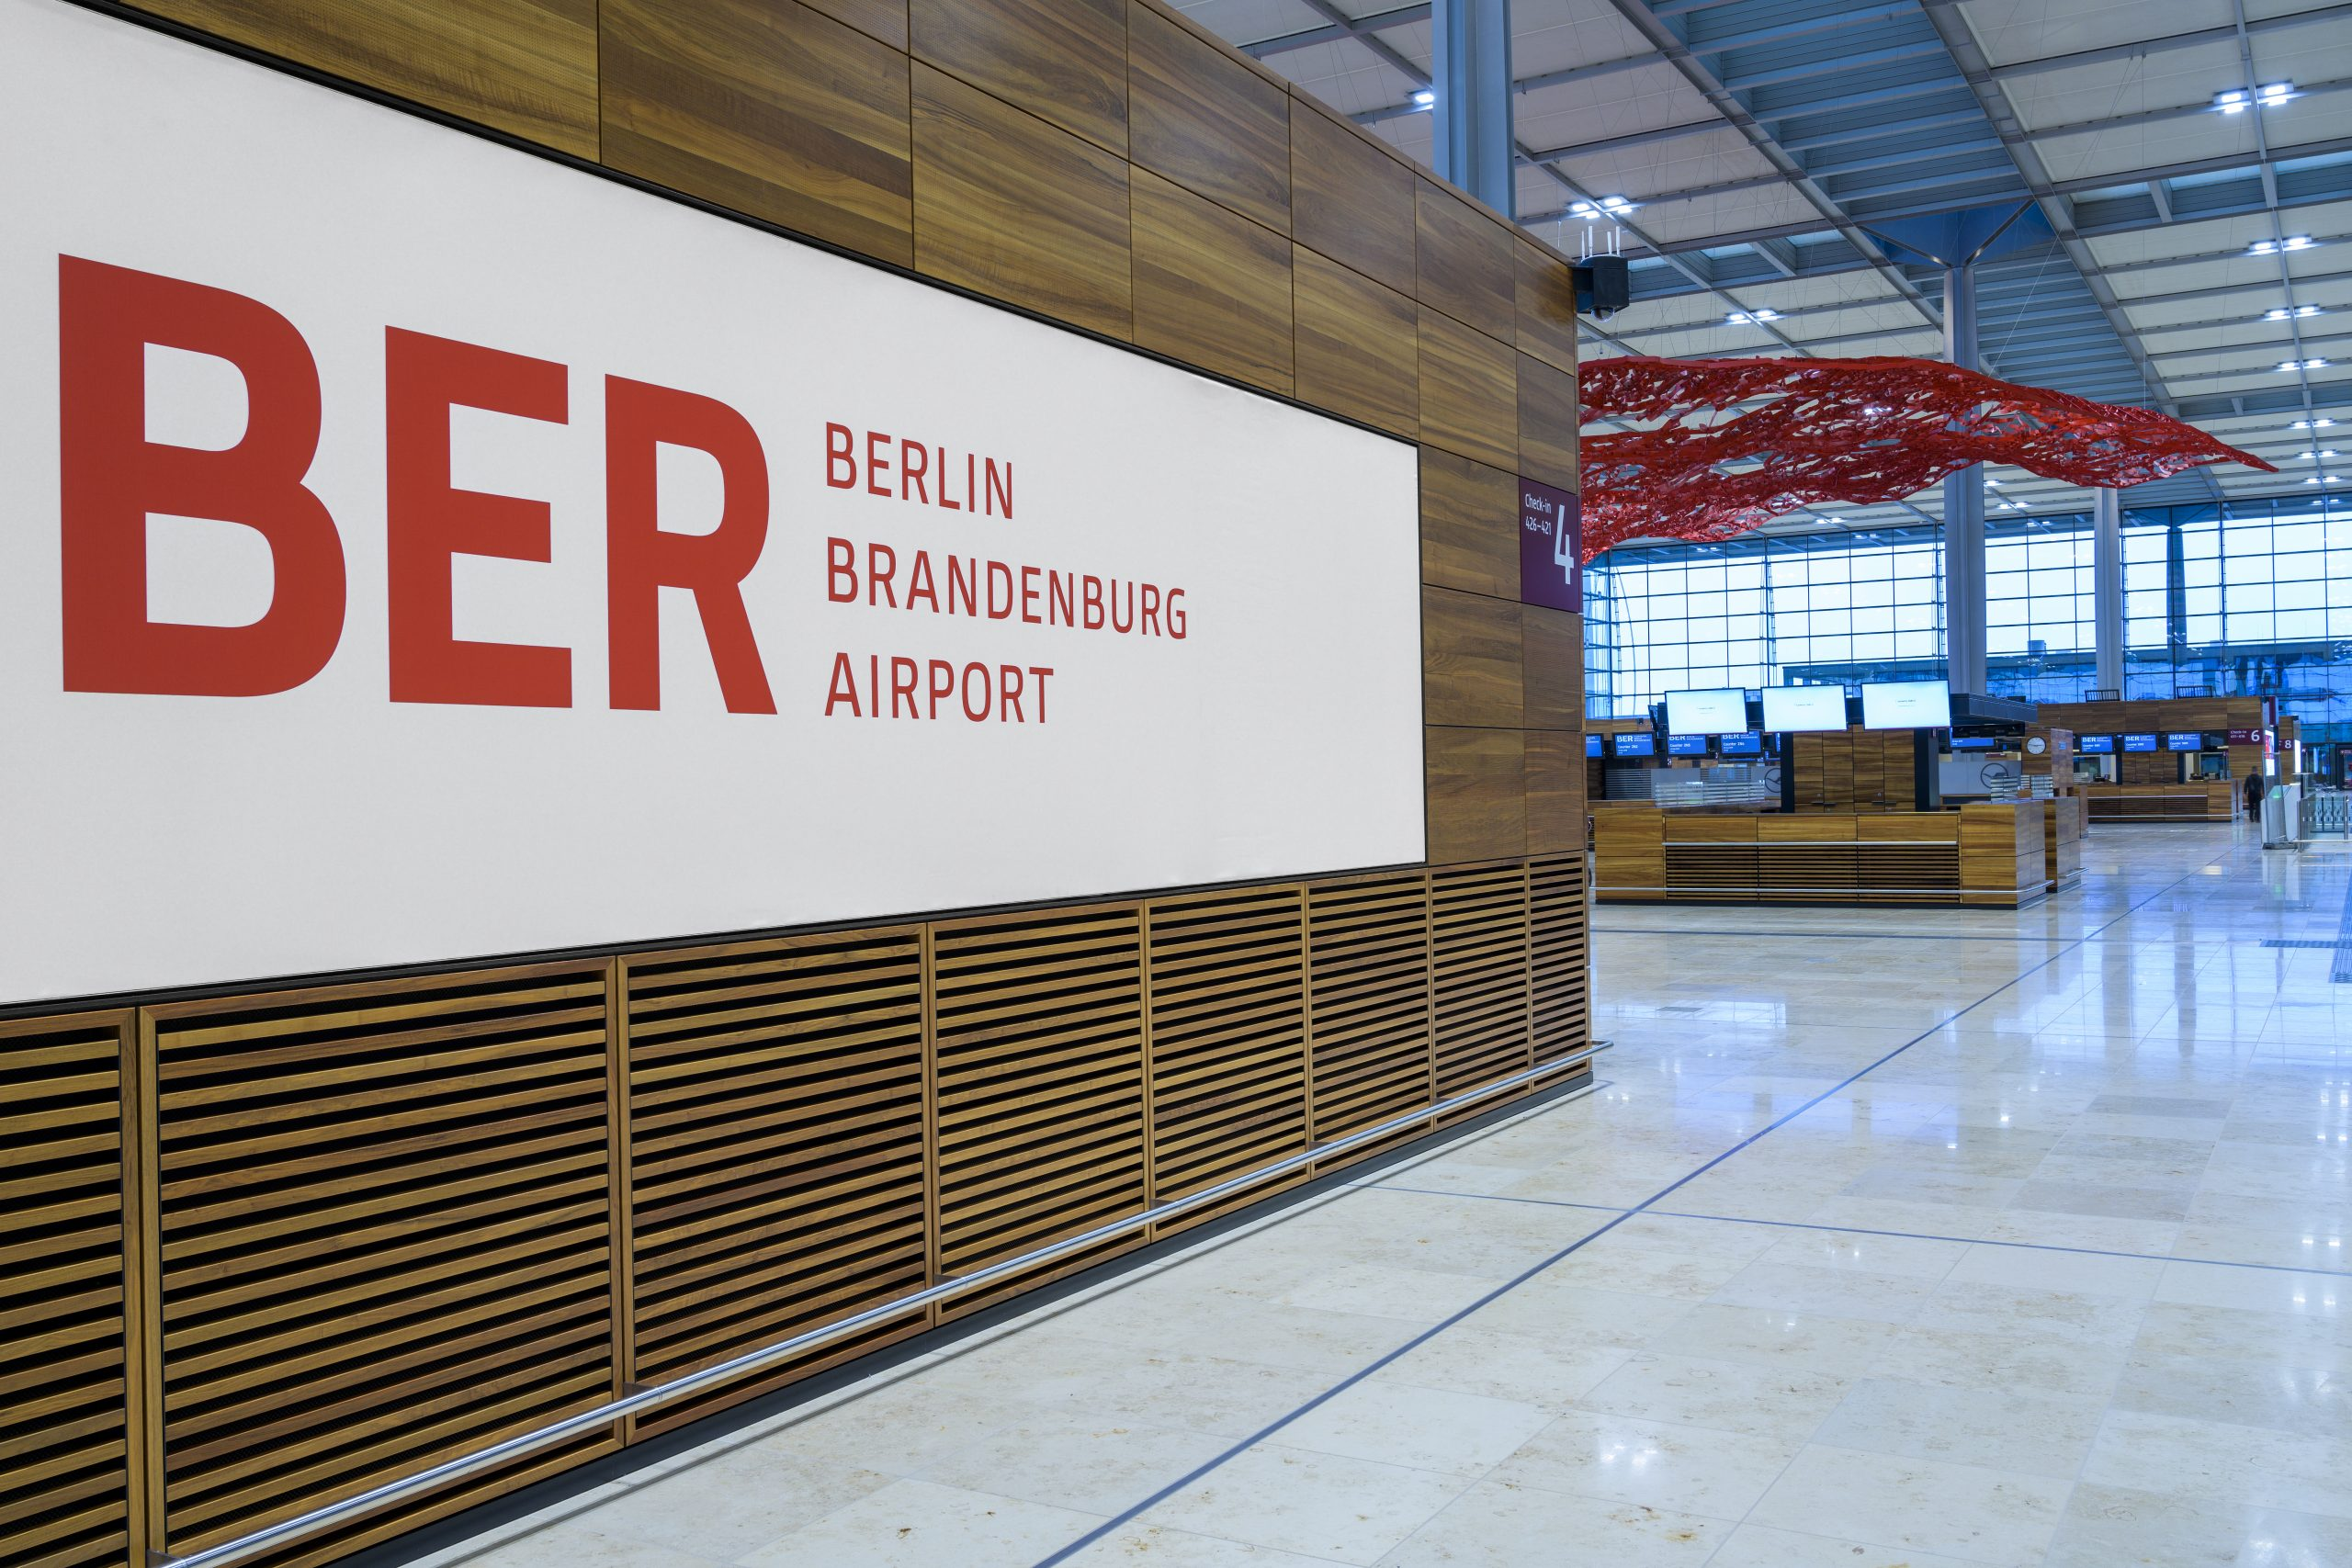 Den nye BER – Berlin Brandenburg lufthavn.